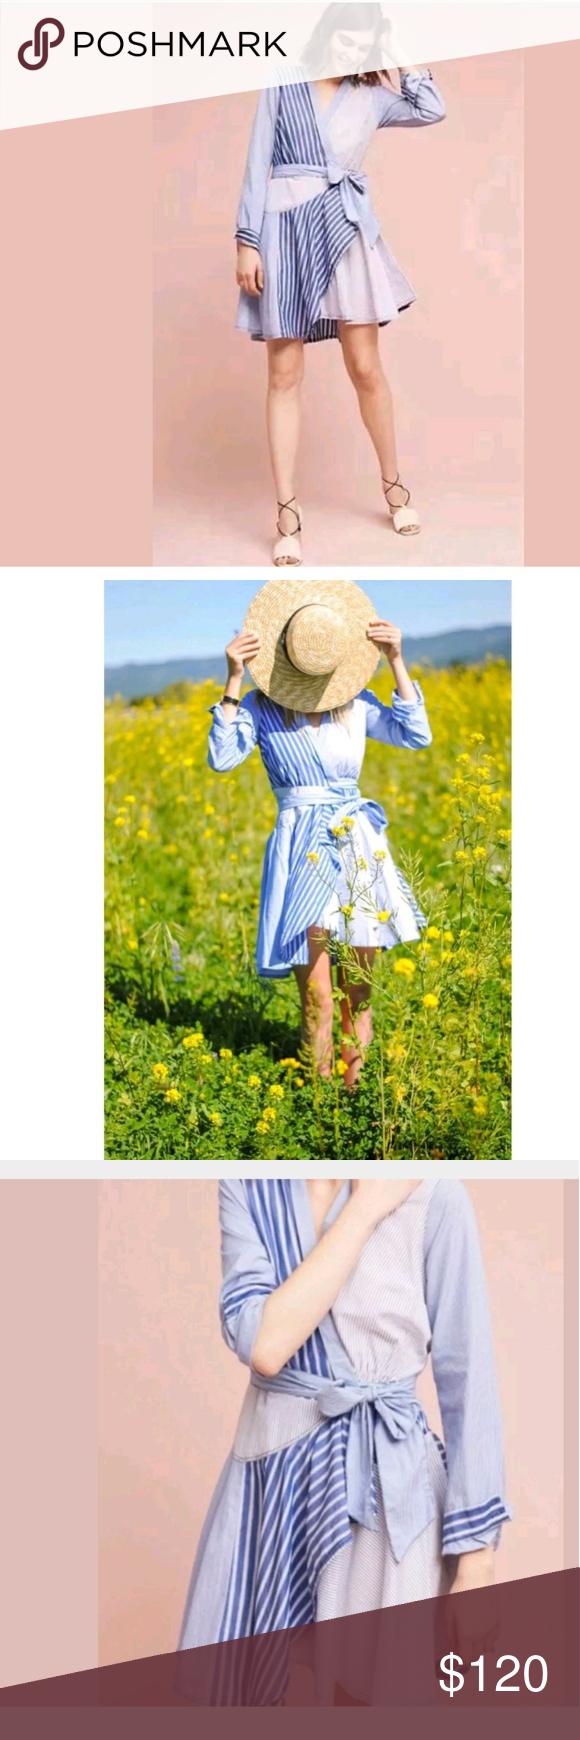 8be2b4f7654 Anthropologie Maeve Newport Stripe Shirtdress Sz 6 Anthropologie Maeve  Newport Striped Long Sleeve Shirtdress Size 5. Maeve Dresses Long Sleeve